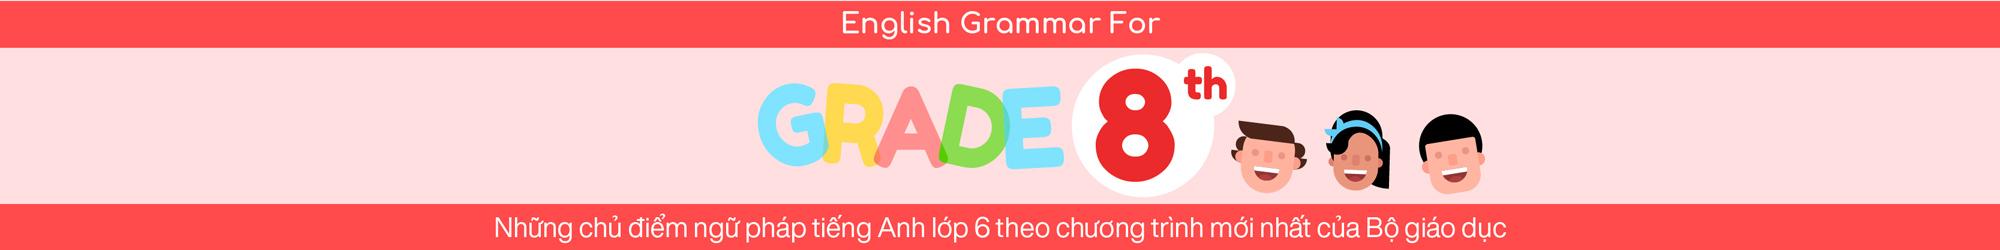 ENGLISH GRAMMAR FOR 8TH GRADE banner